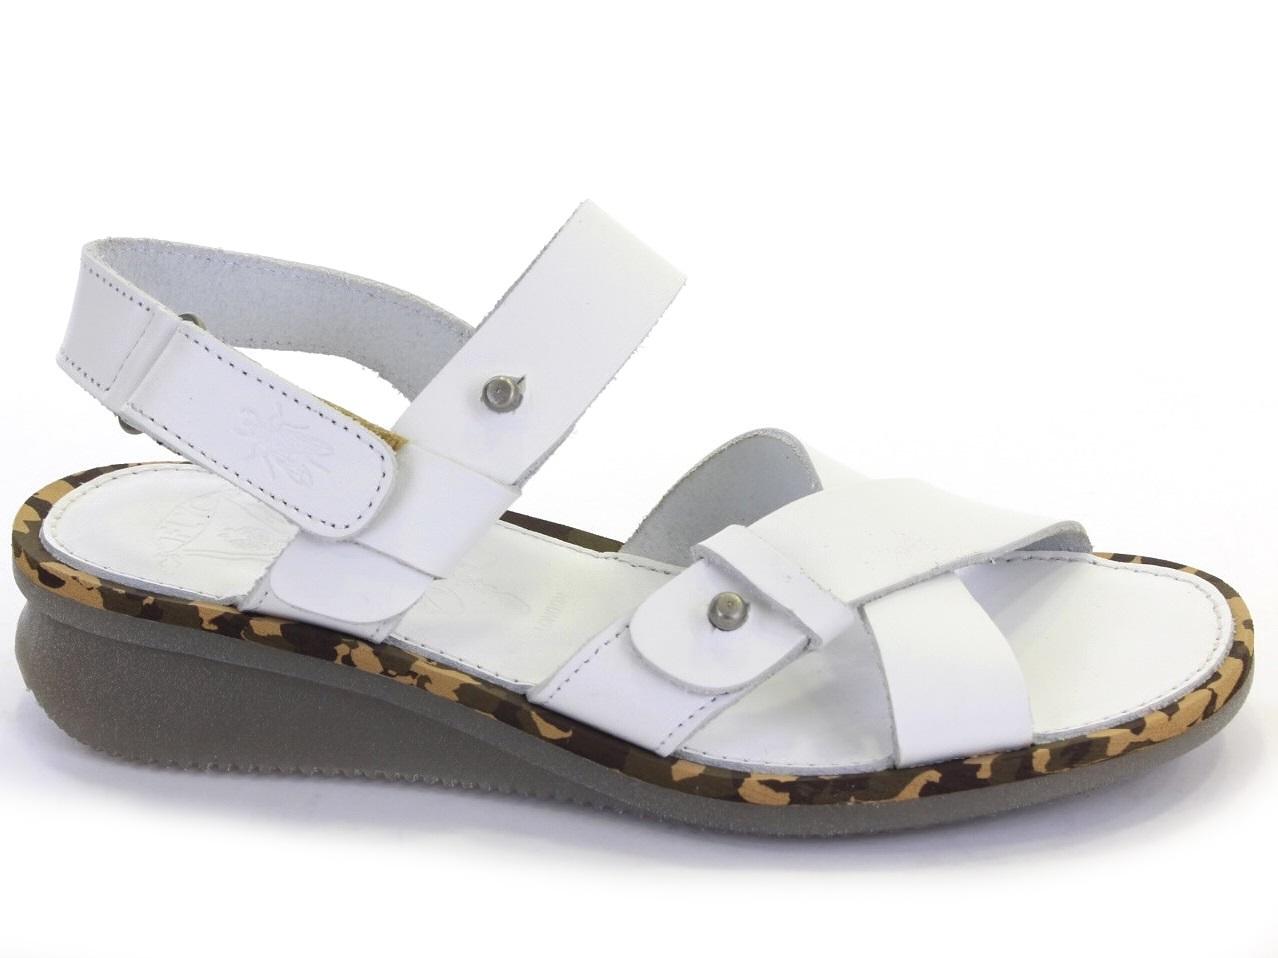 Flat Sandals Fly London - 339 CRIB257FLY